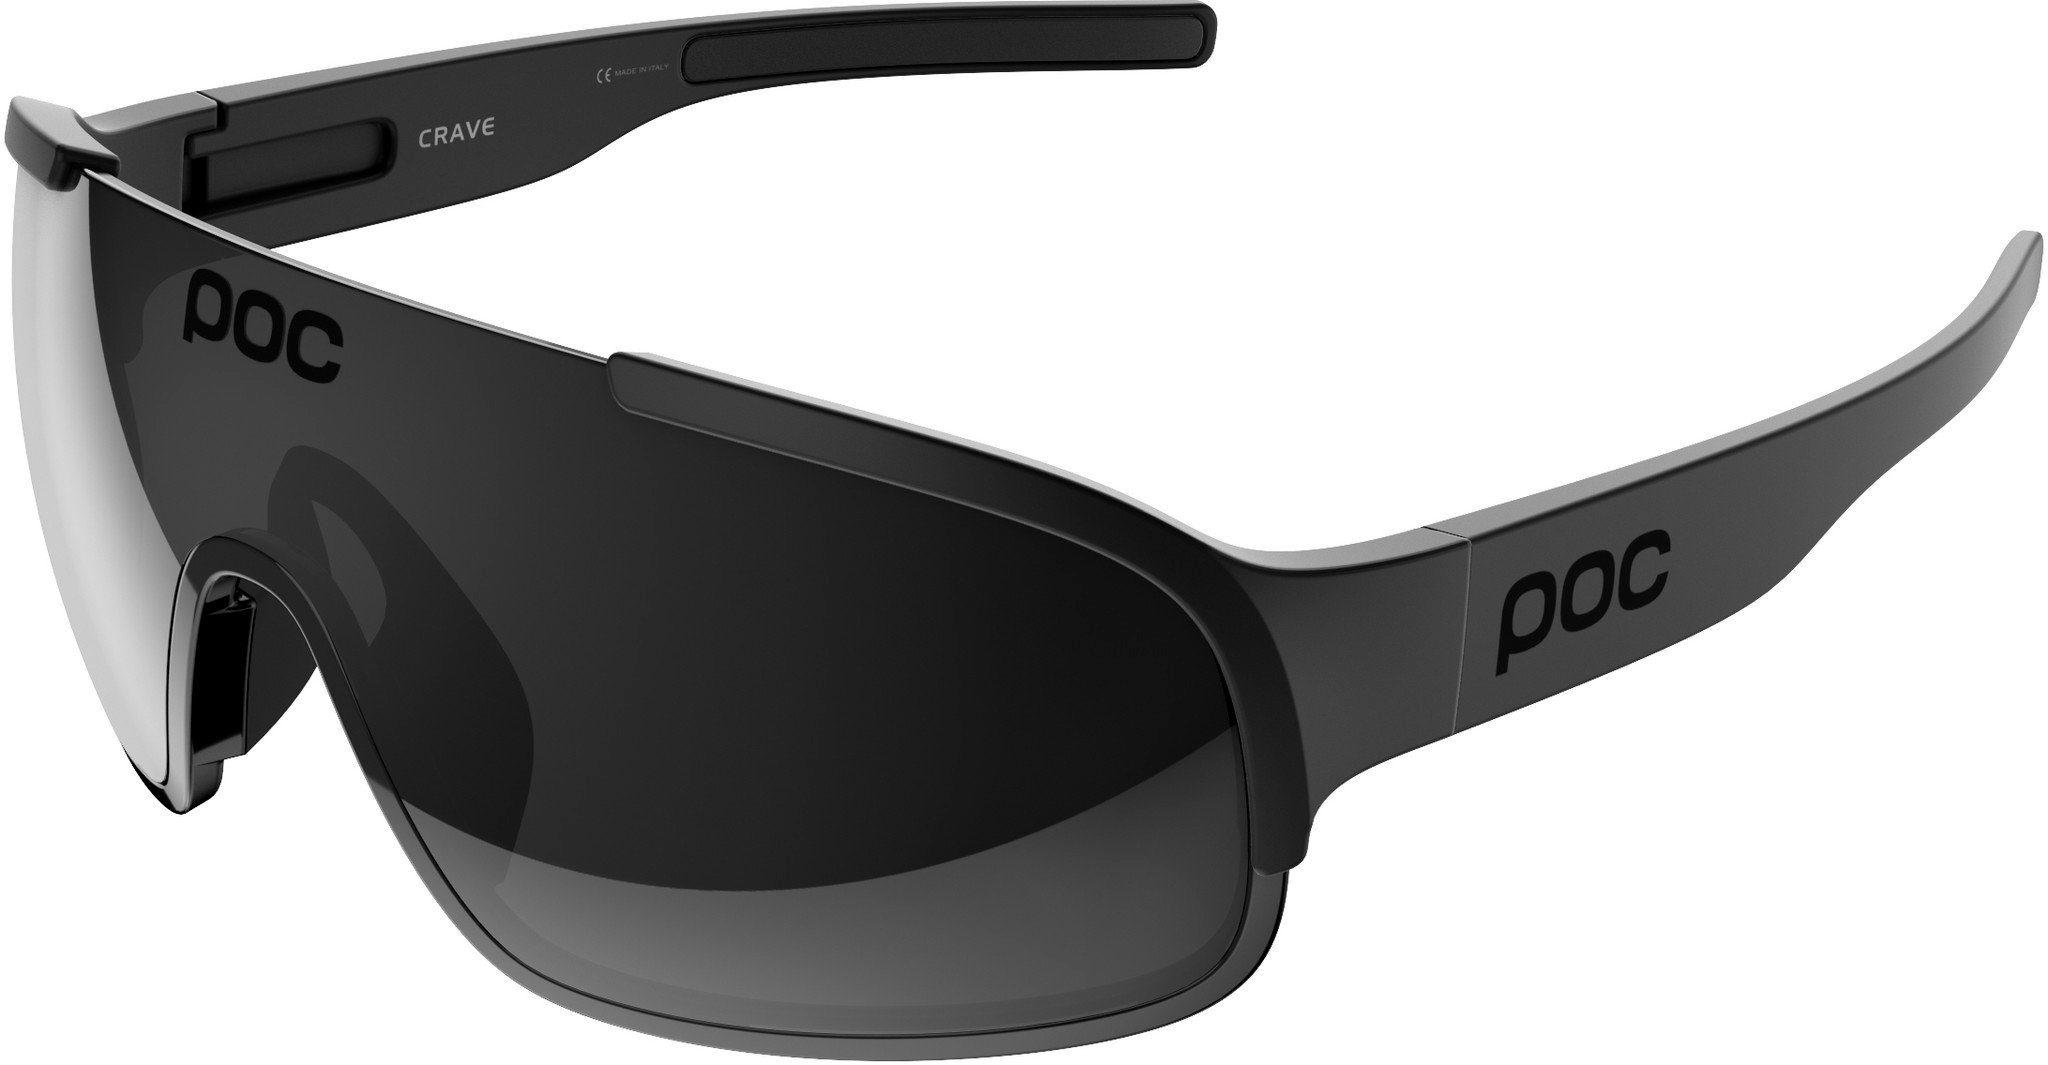 POC Sportbrille »Crave Glasses«